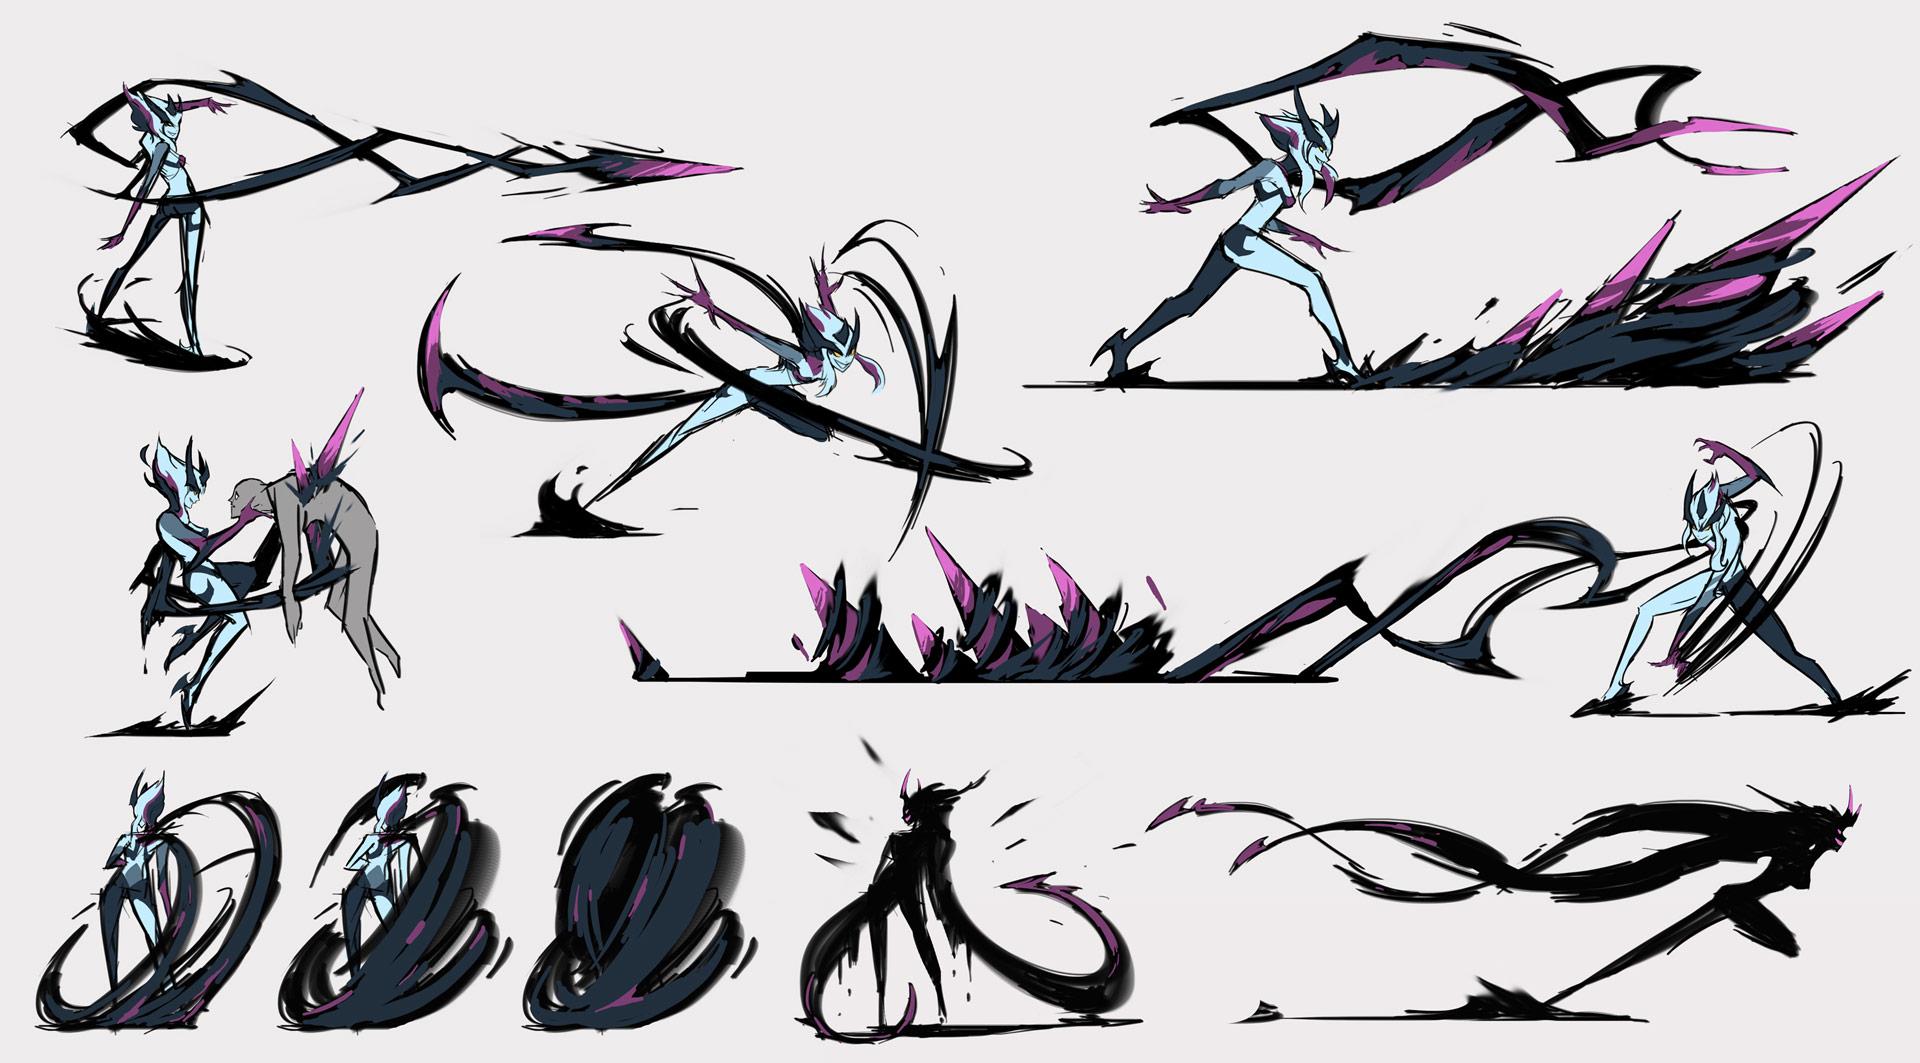 Evelynn_Animation_Study.jpg